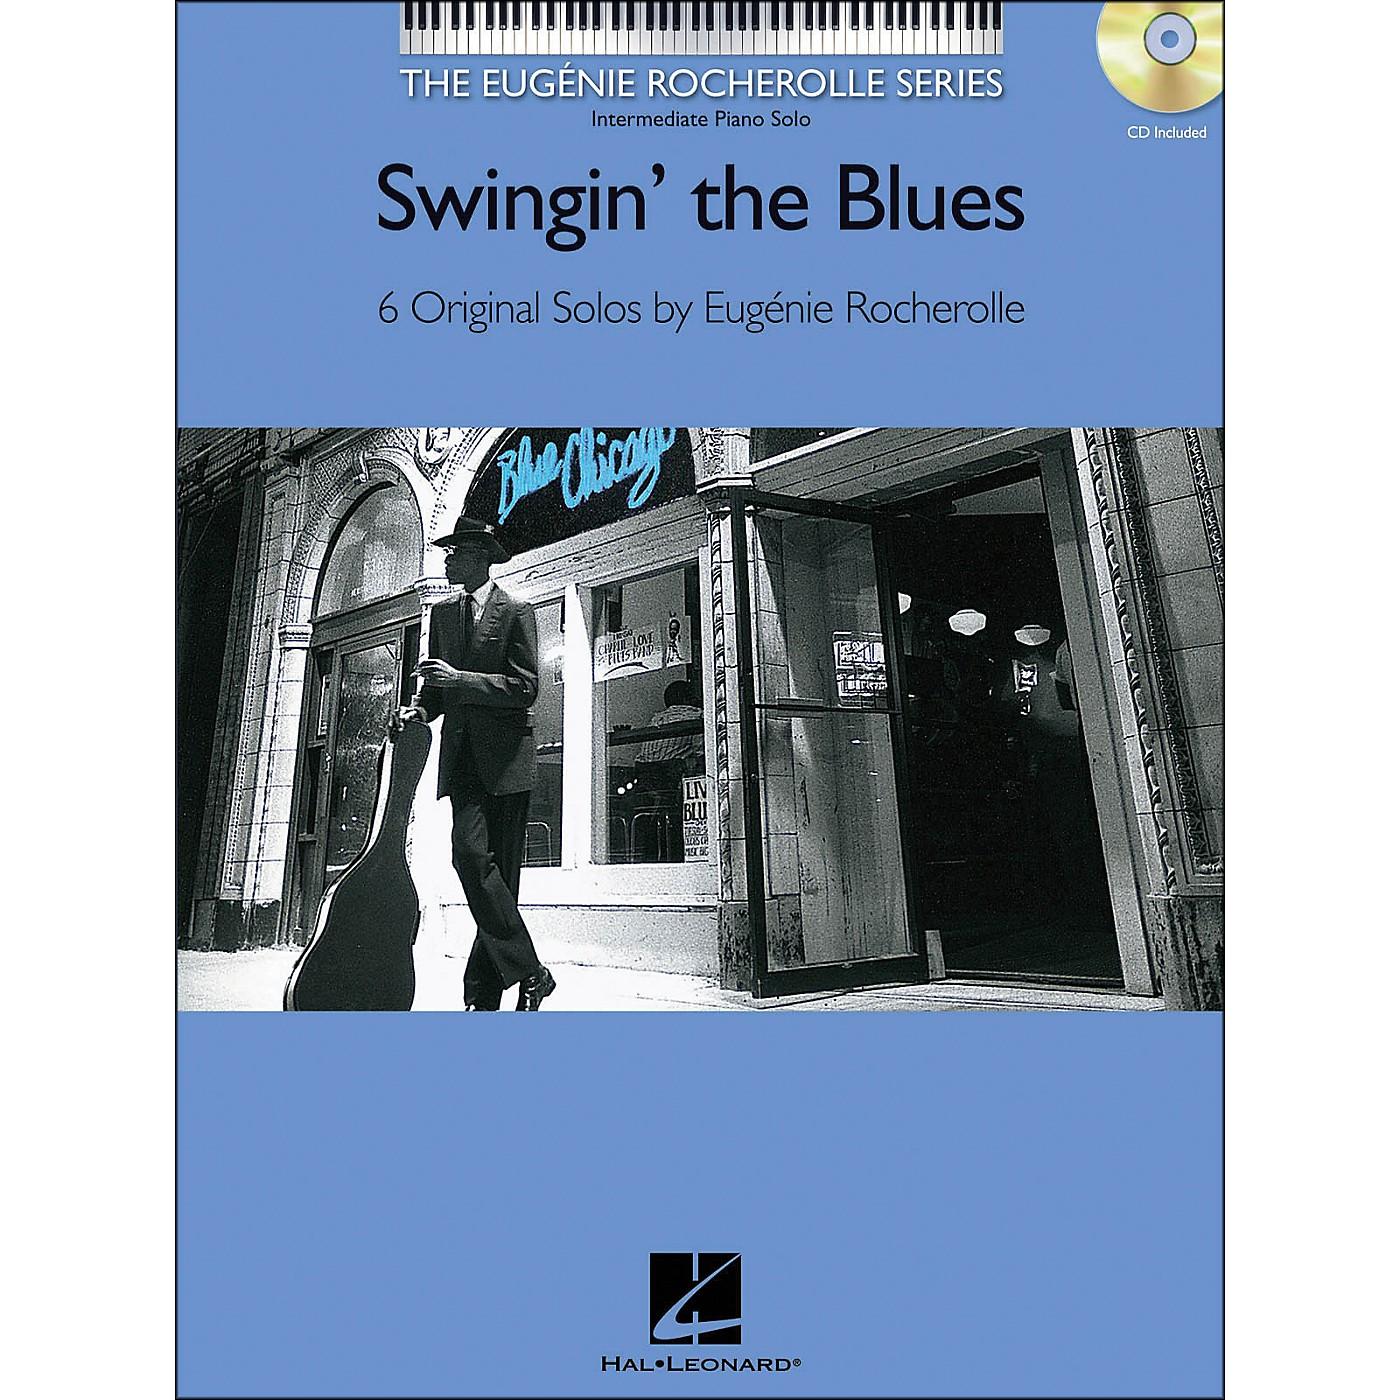 Hal Leonard Swingin' The Blues Book/CD Eugenie Rocherolle Series arranged for piano solo thumbnail